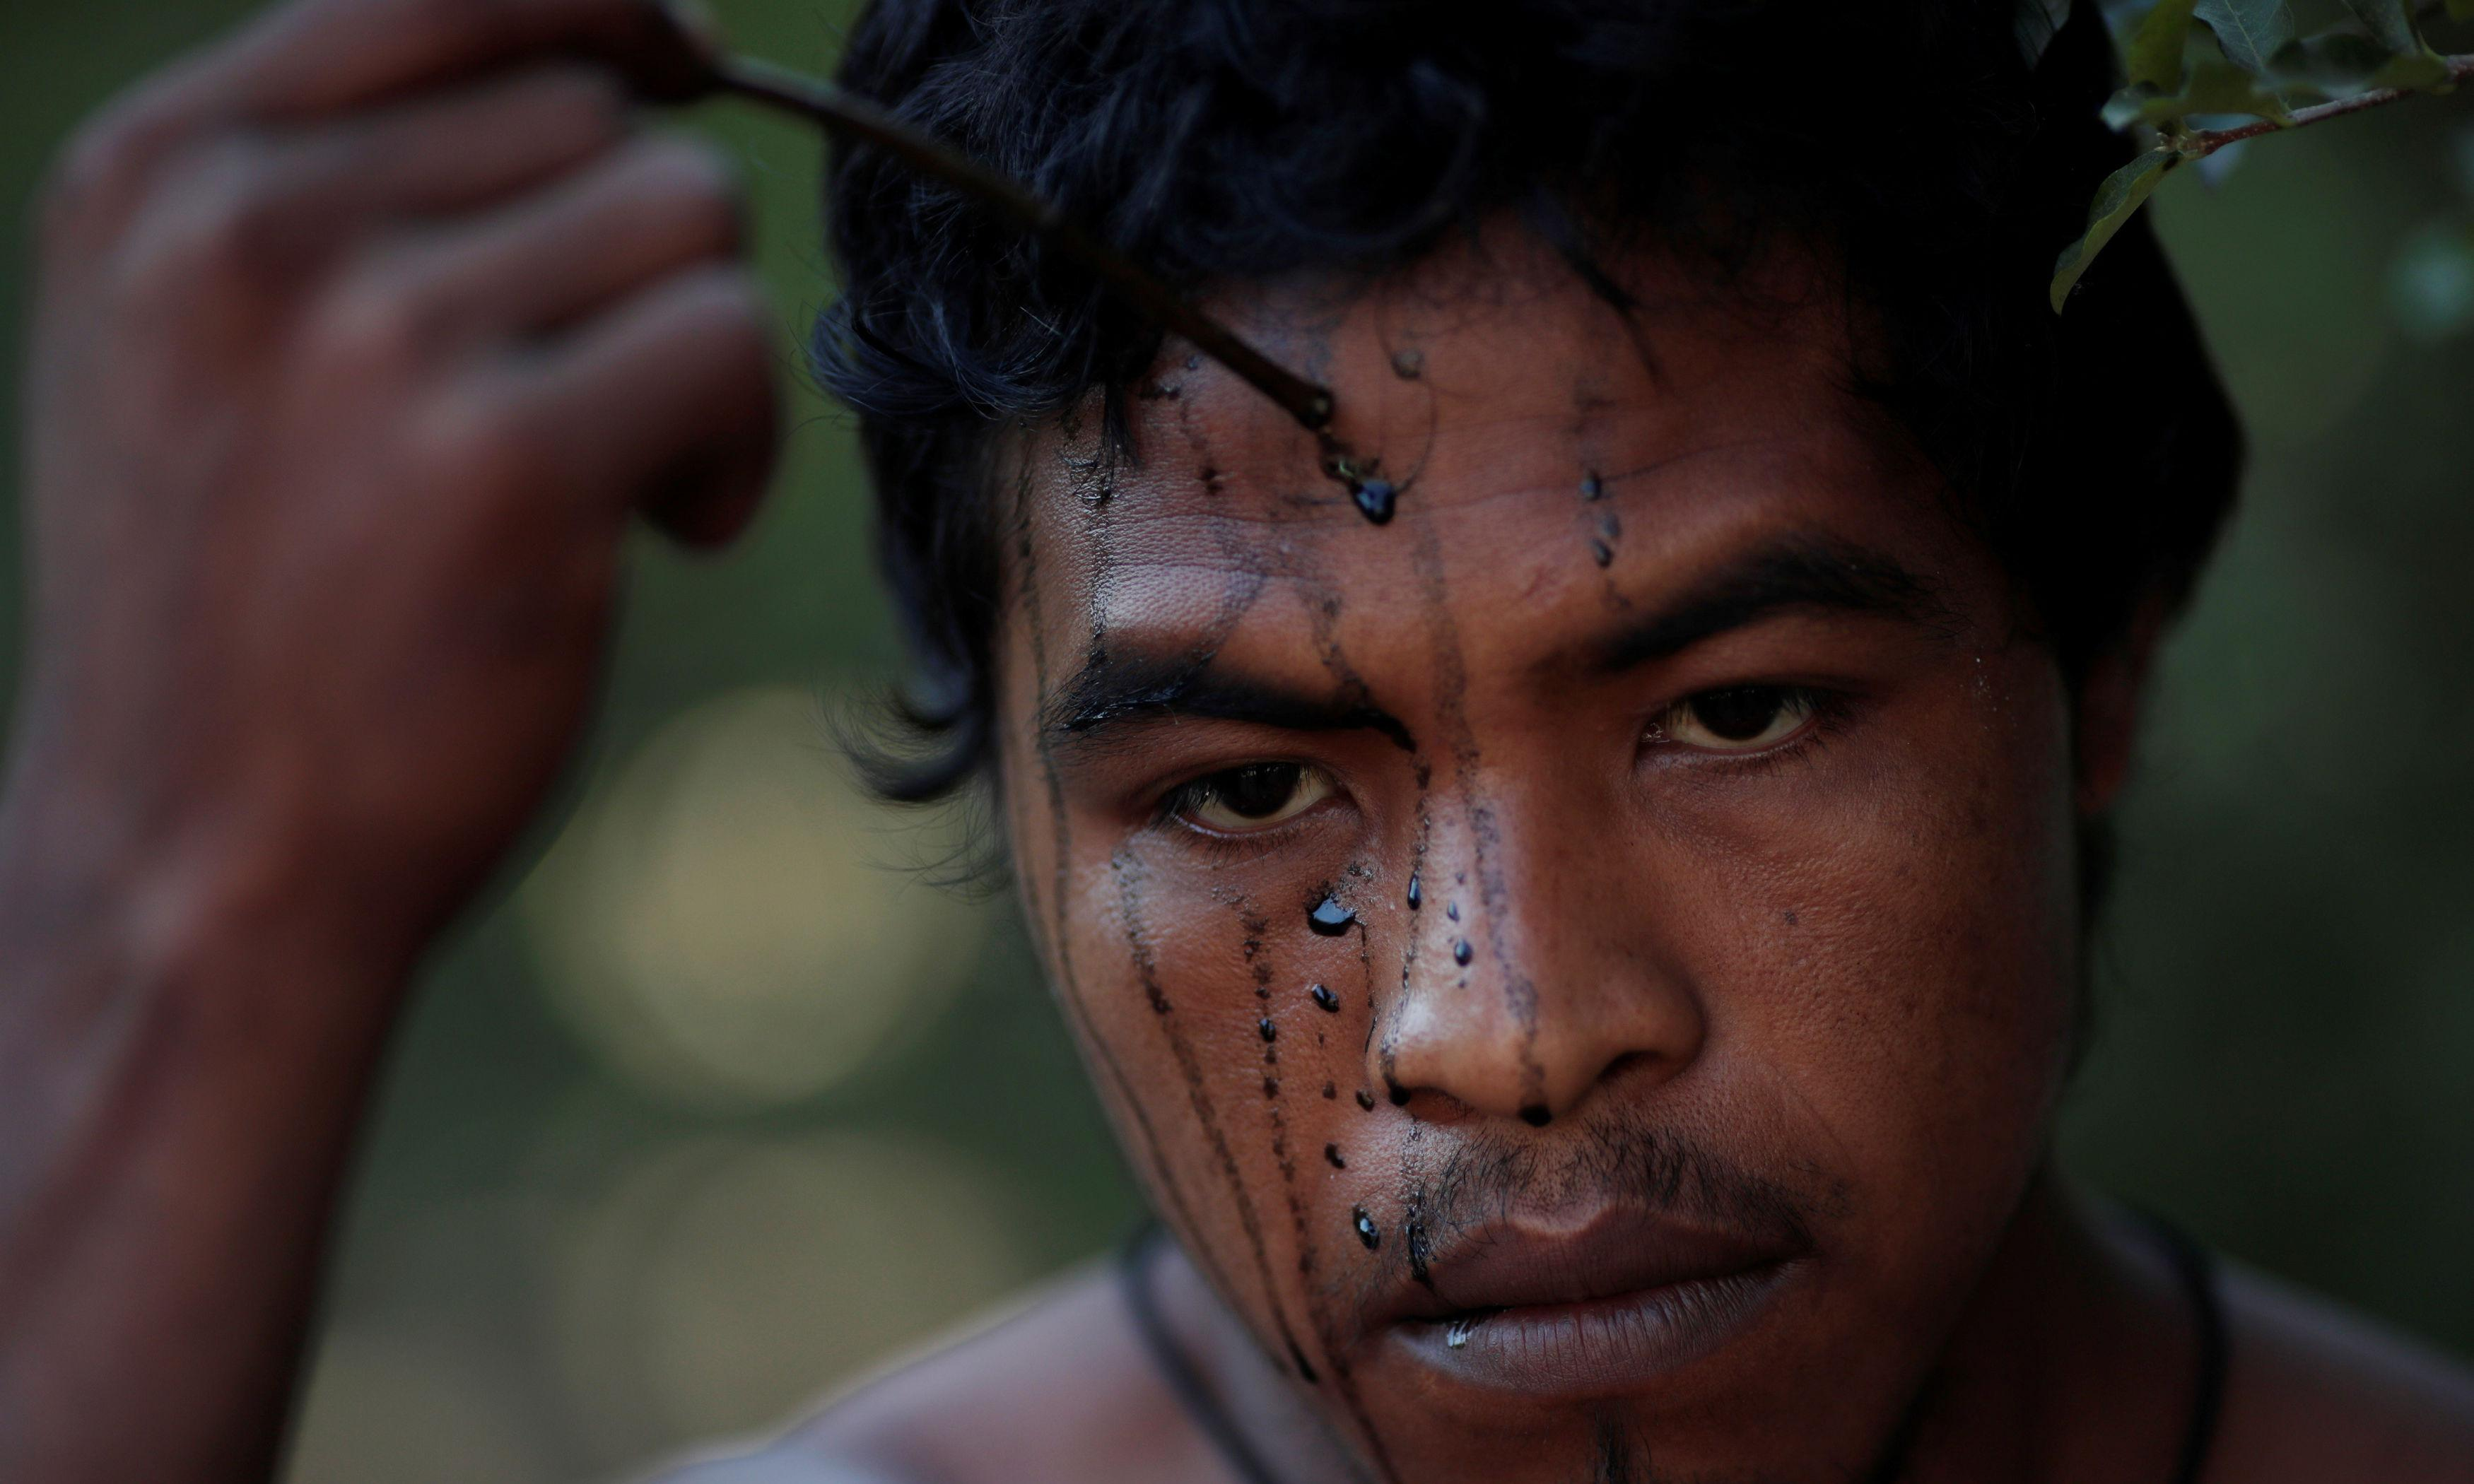 Brazilian 'forest guardian' killed by illegal loggers in ambush